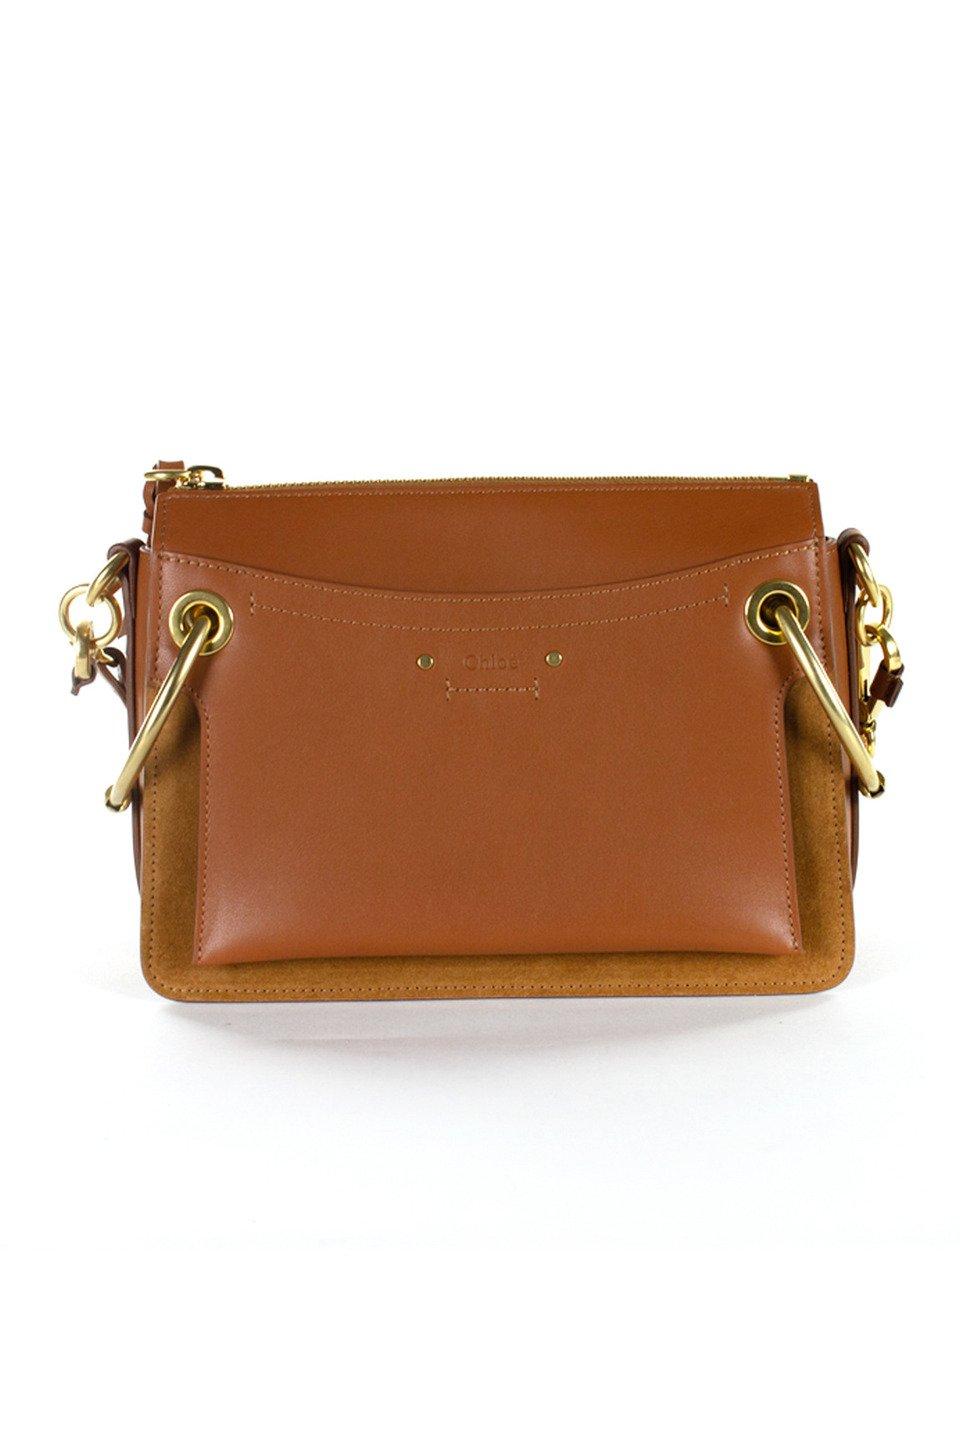 Chloe Leather Handbag in Tan